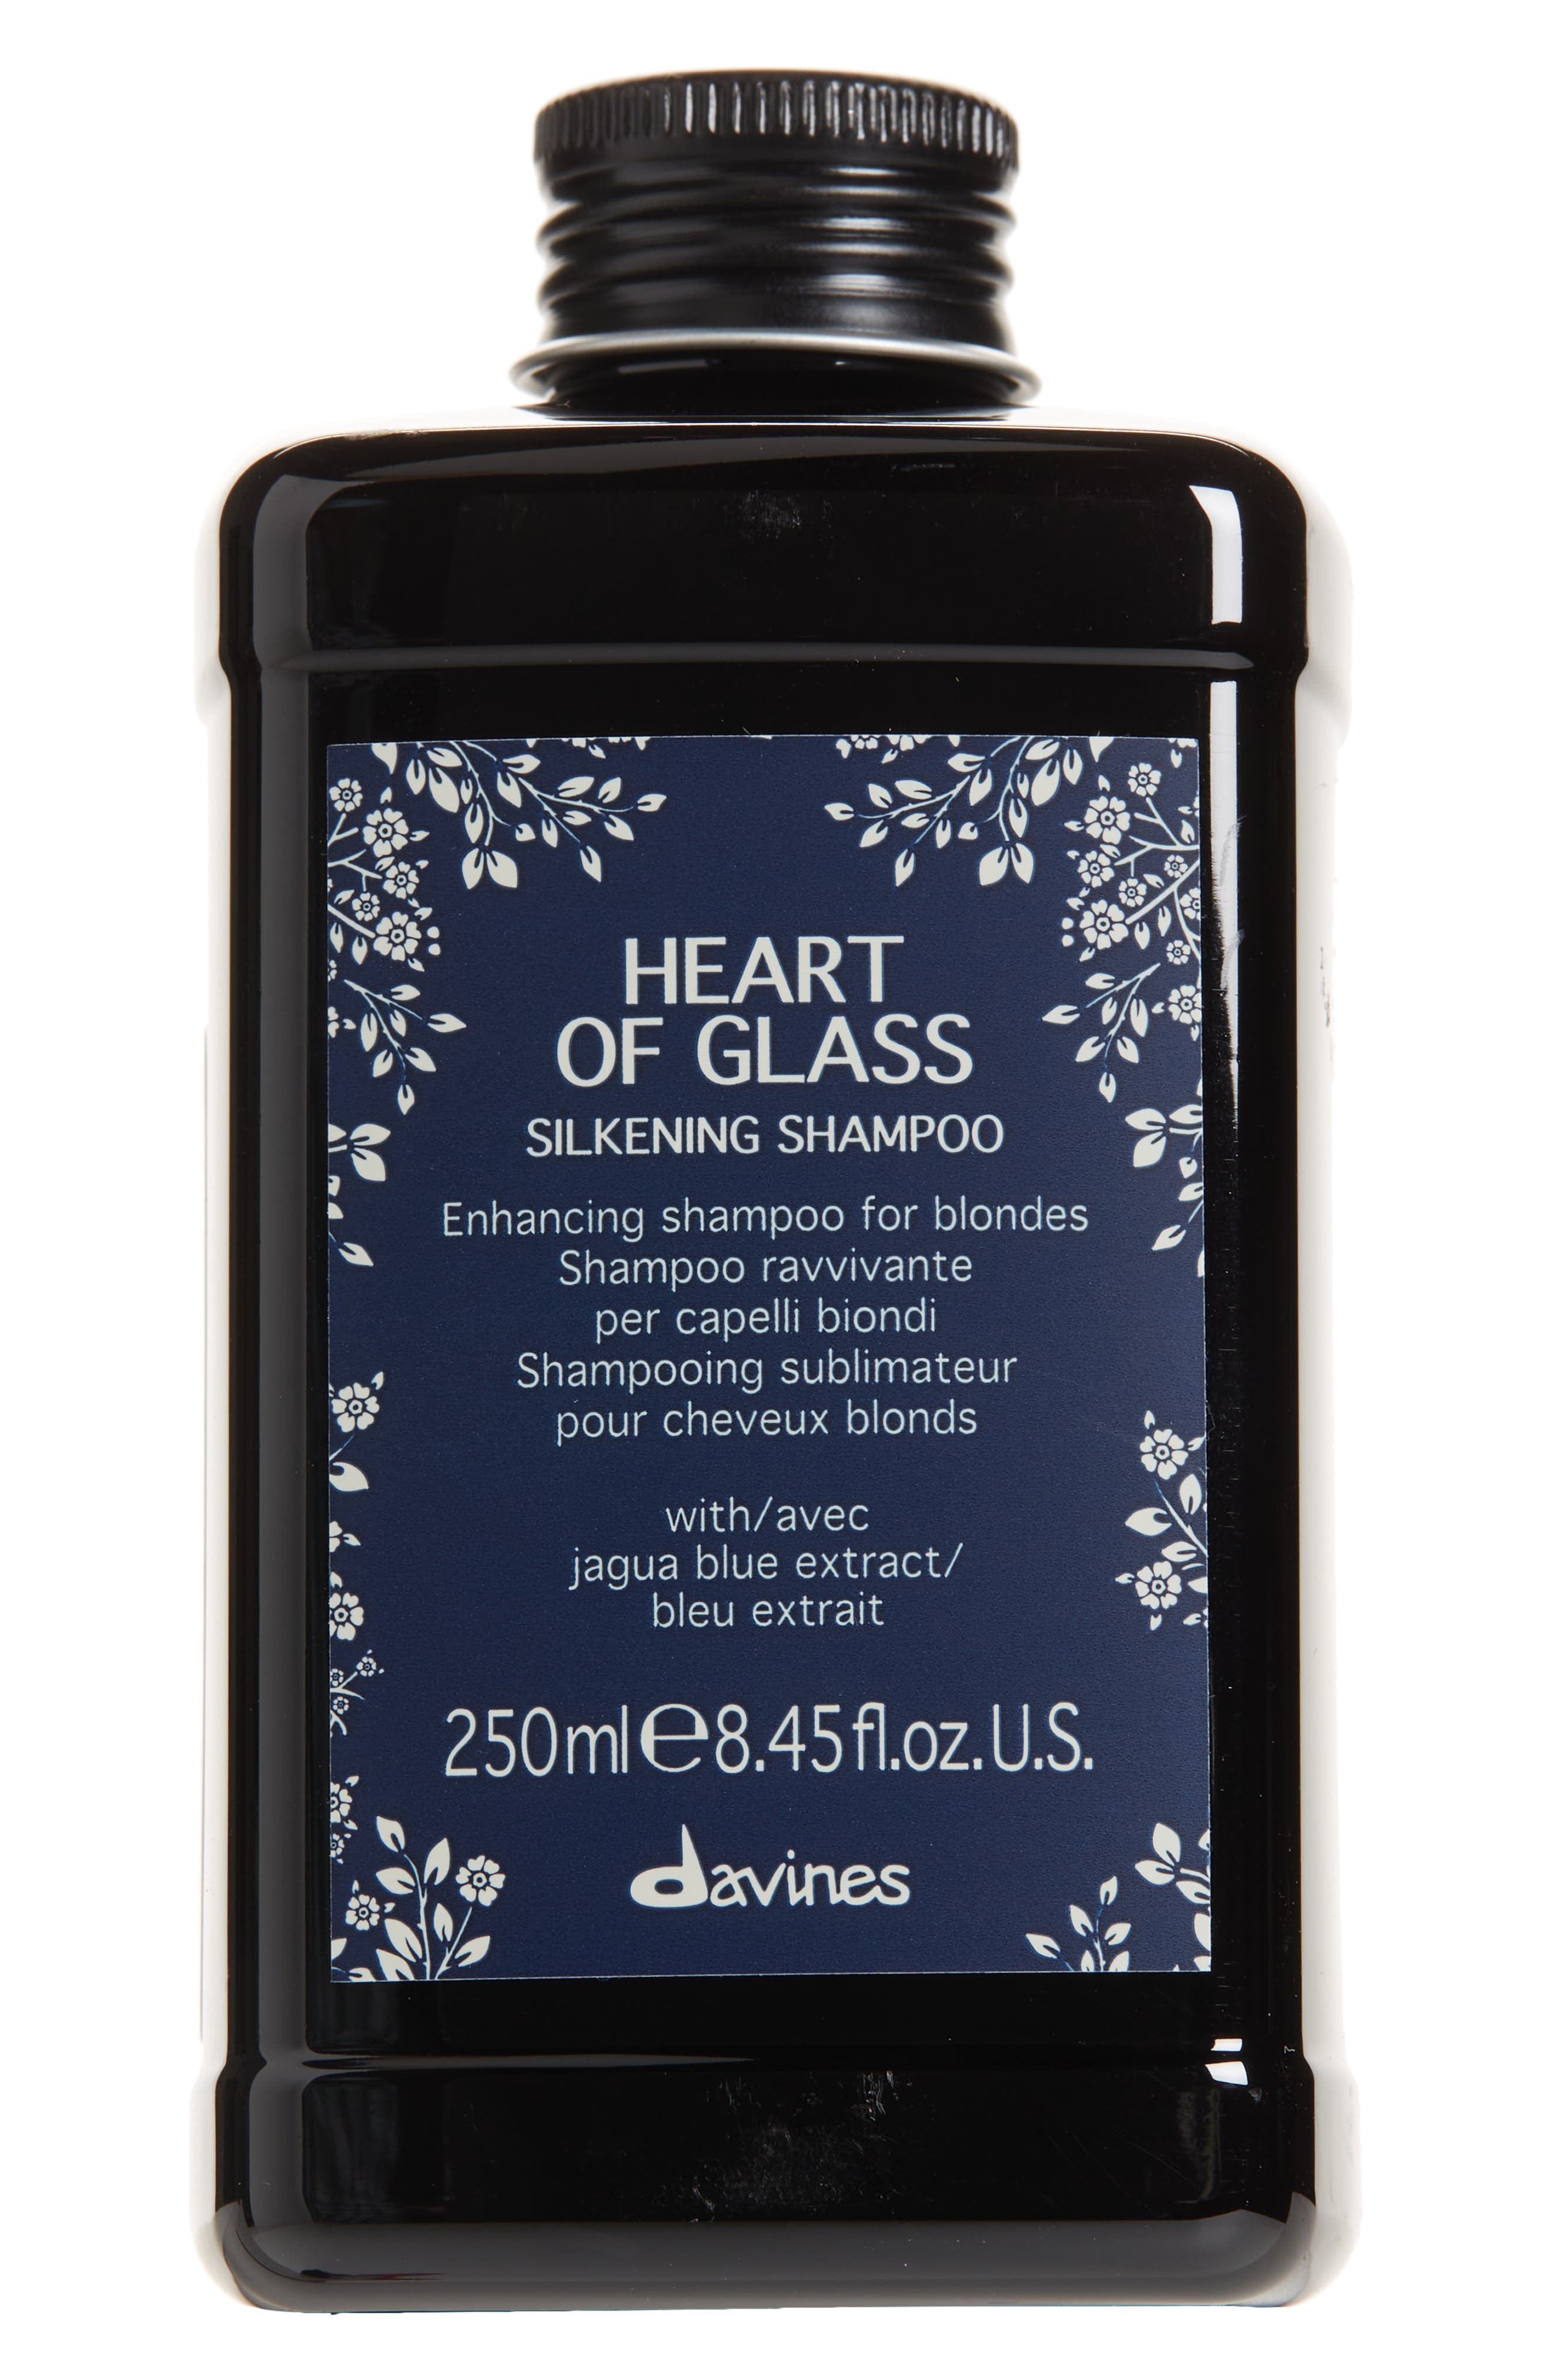 Davins Heart Of Glass Silkening Shampoo